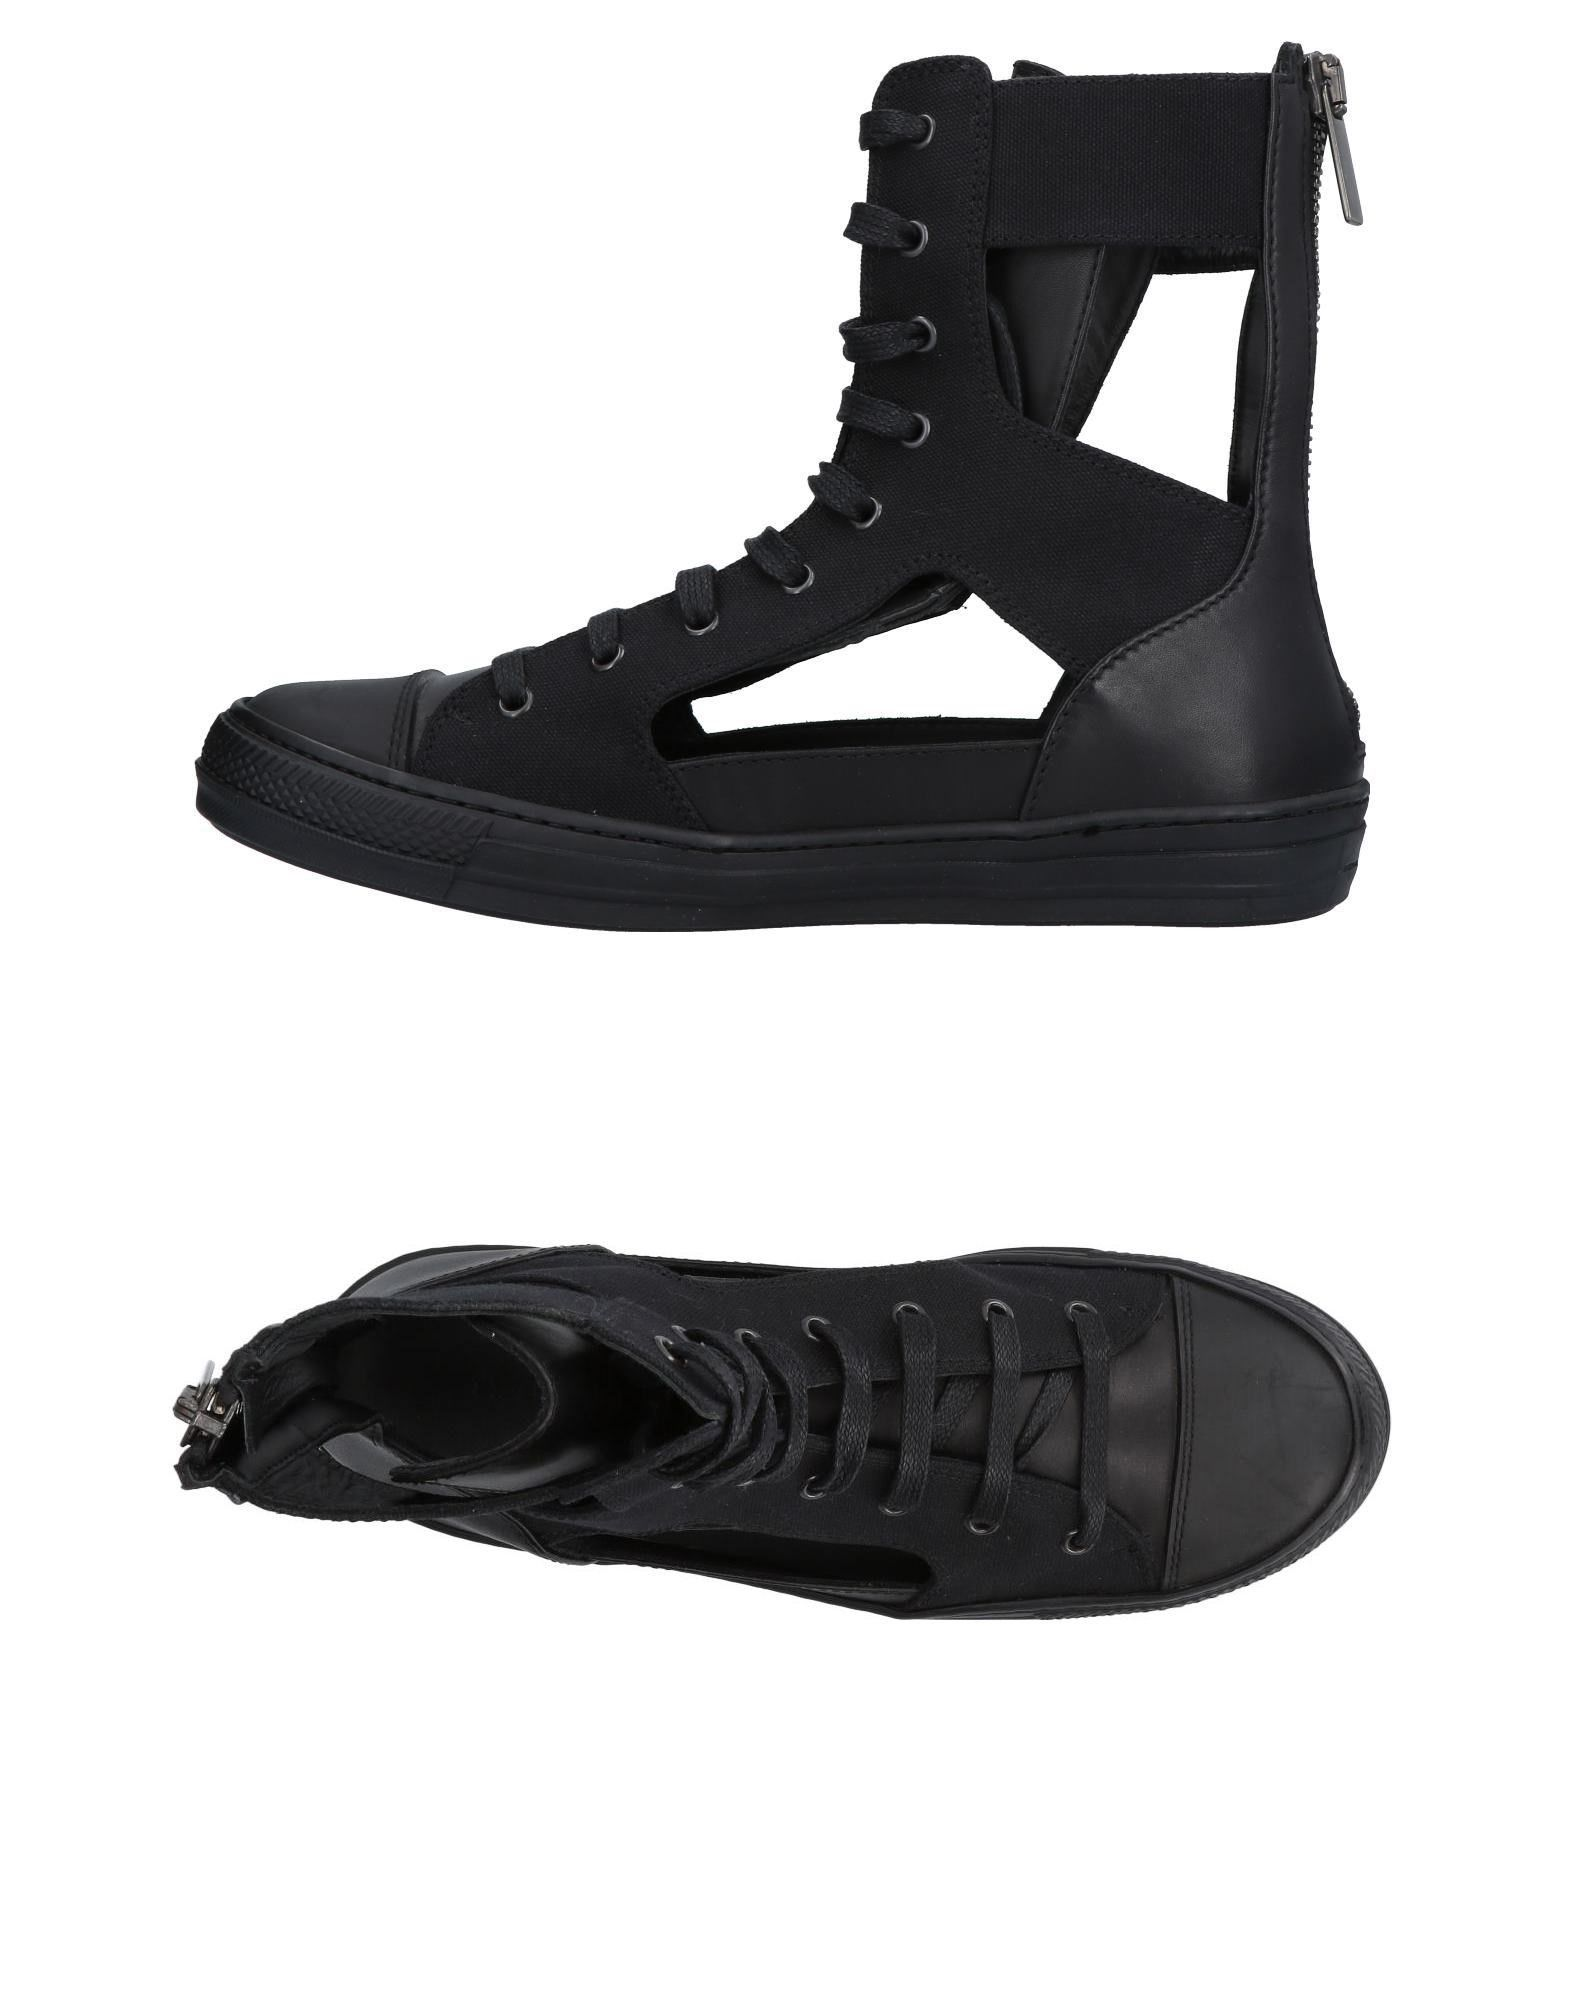 Sneakers Diesel Black Gold Uomo - Acquista online su